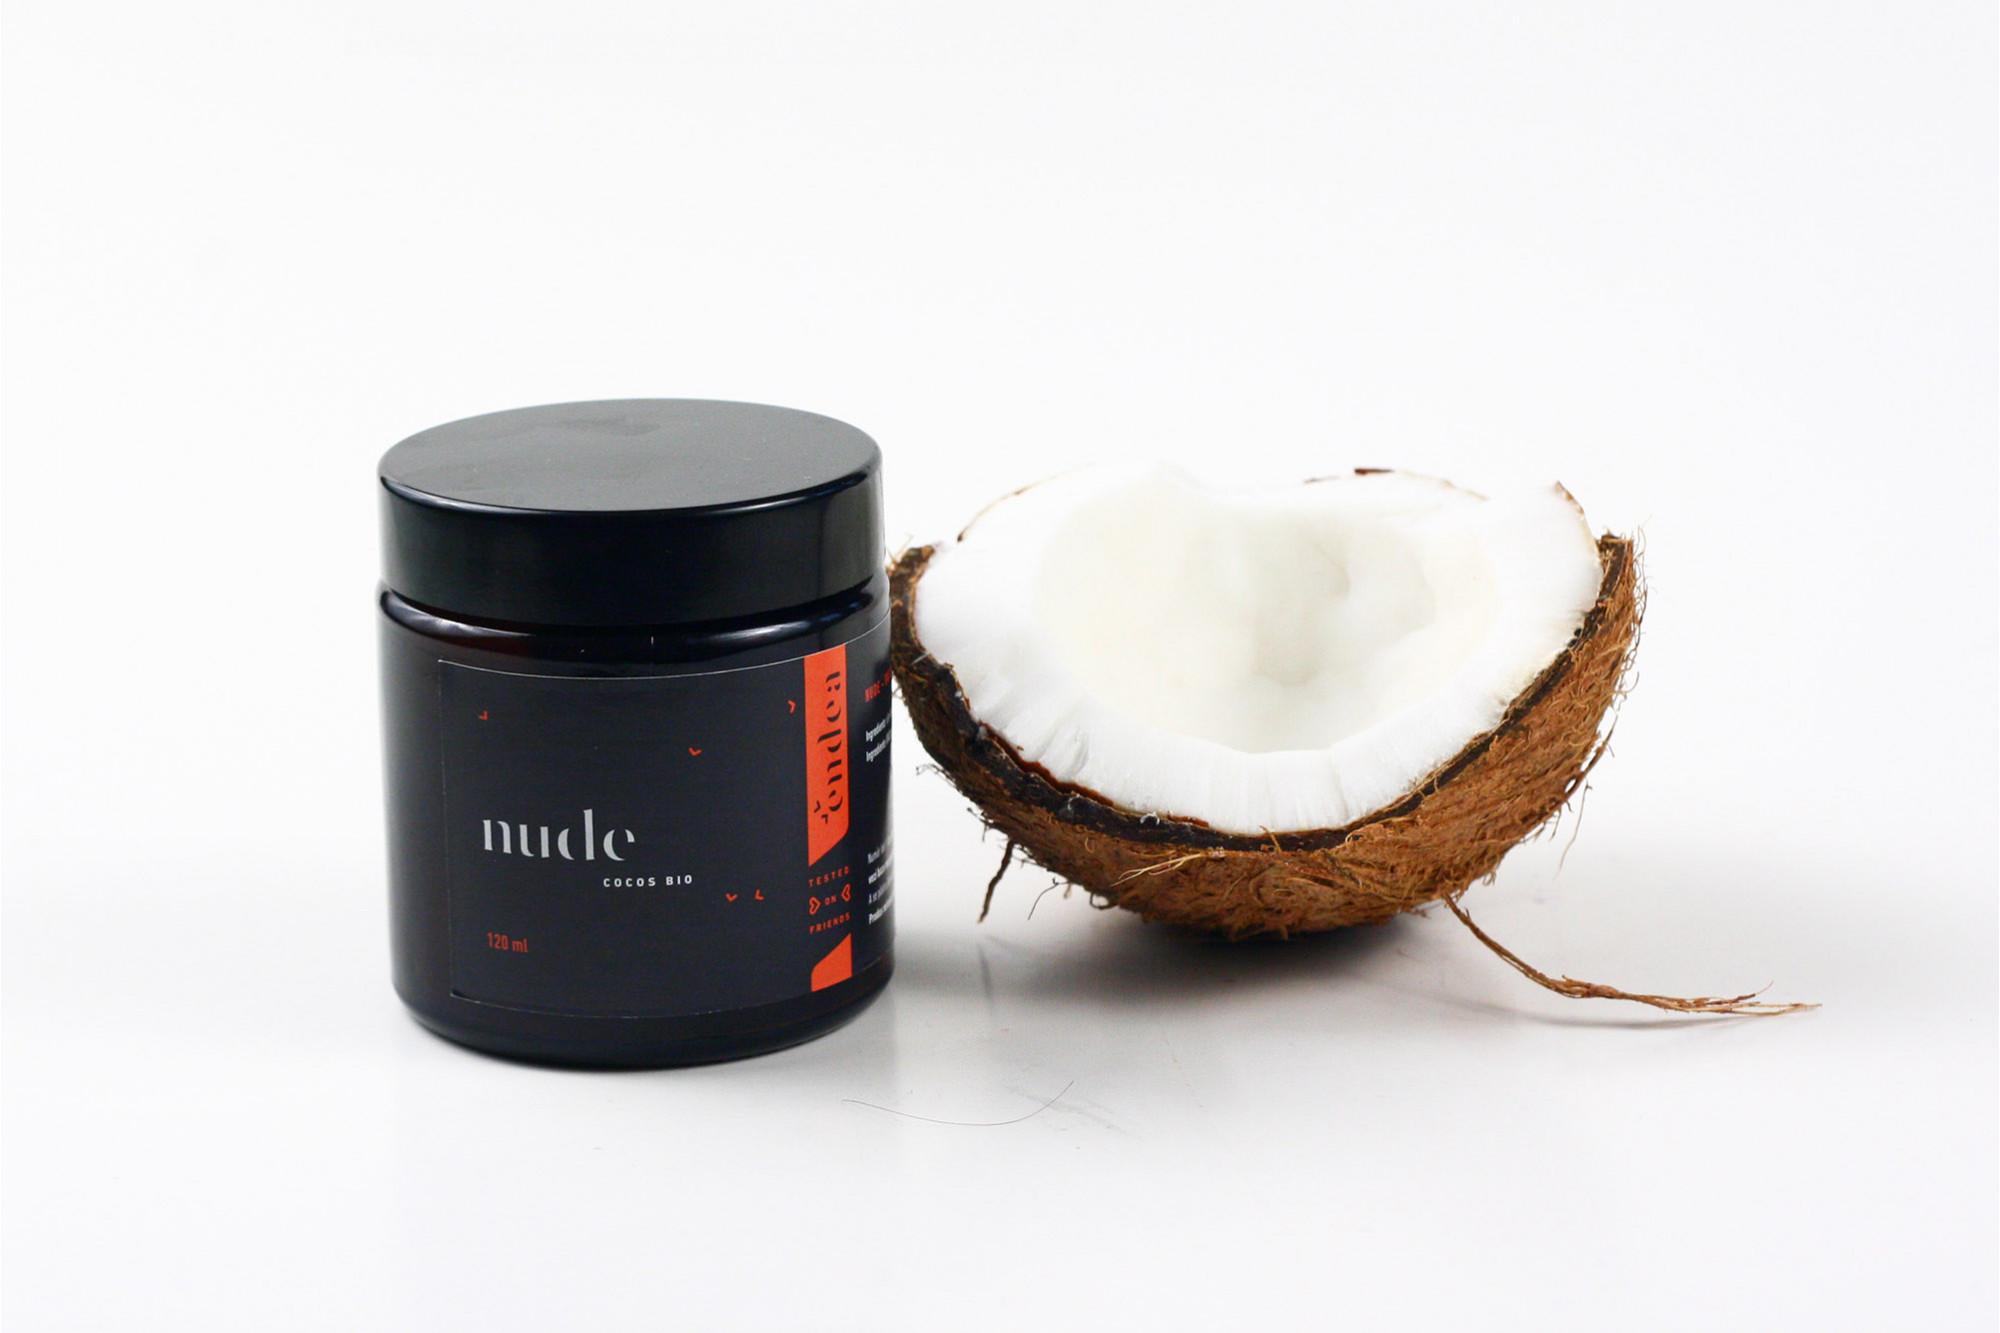 Unt de cocos bio - Nude   Endea - Tested on friends